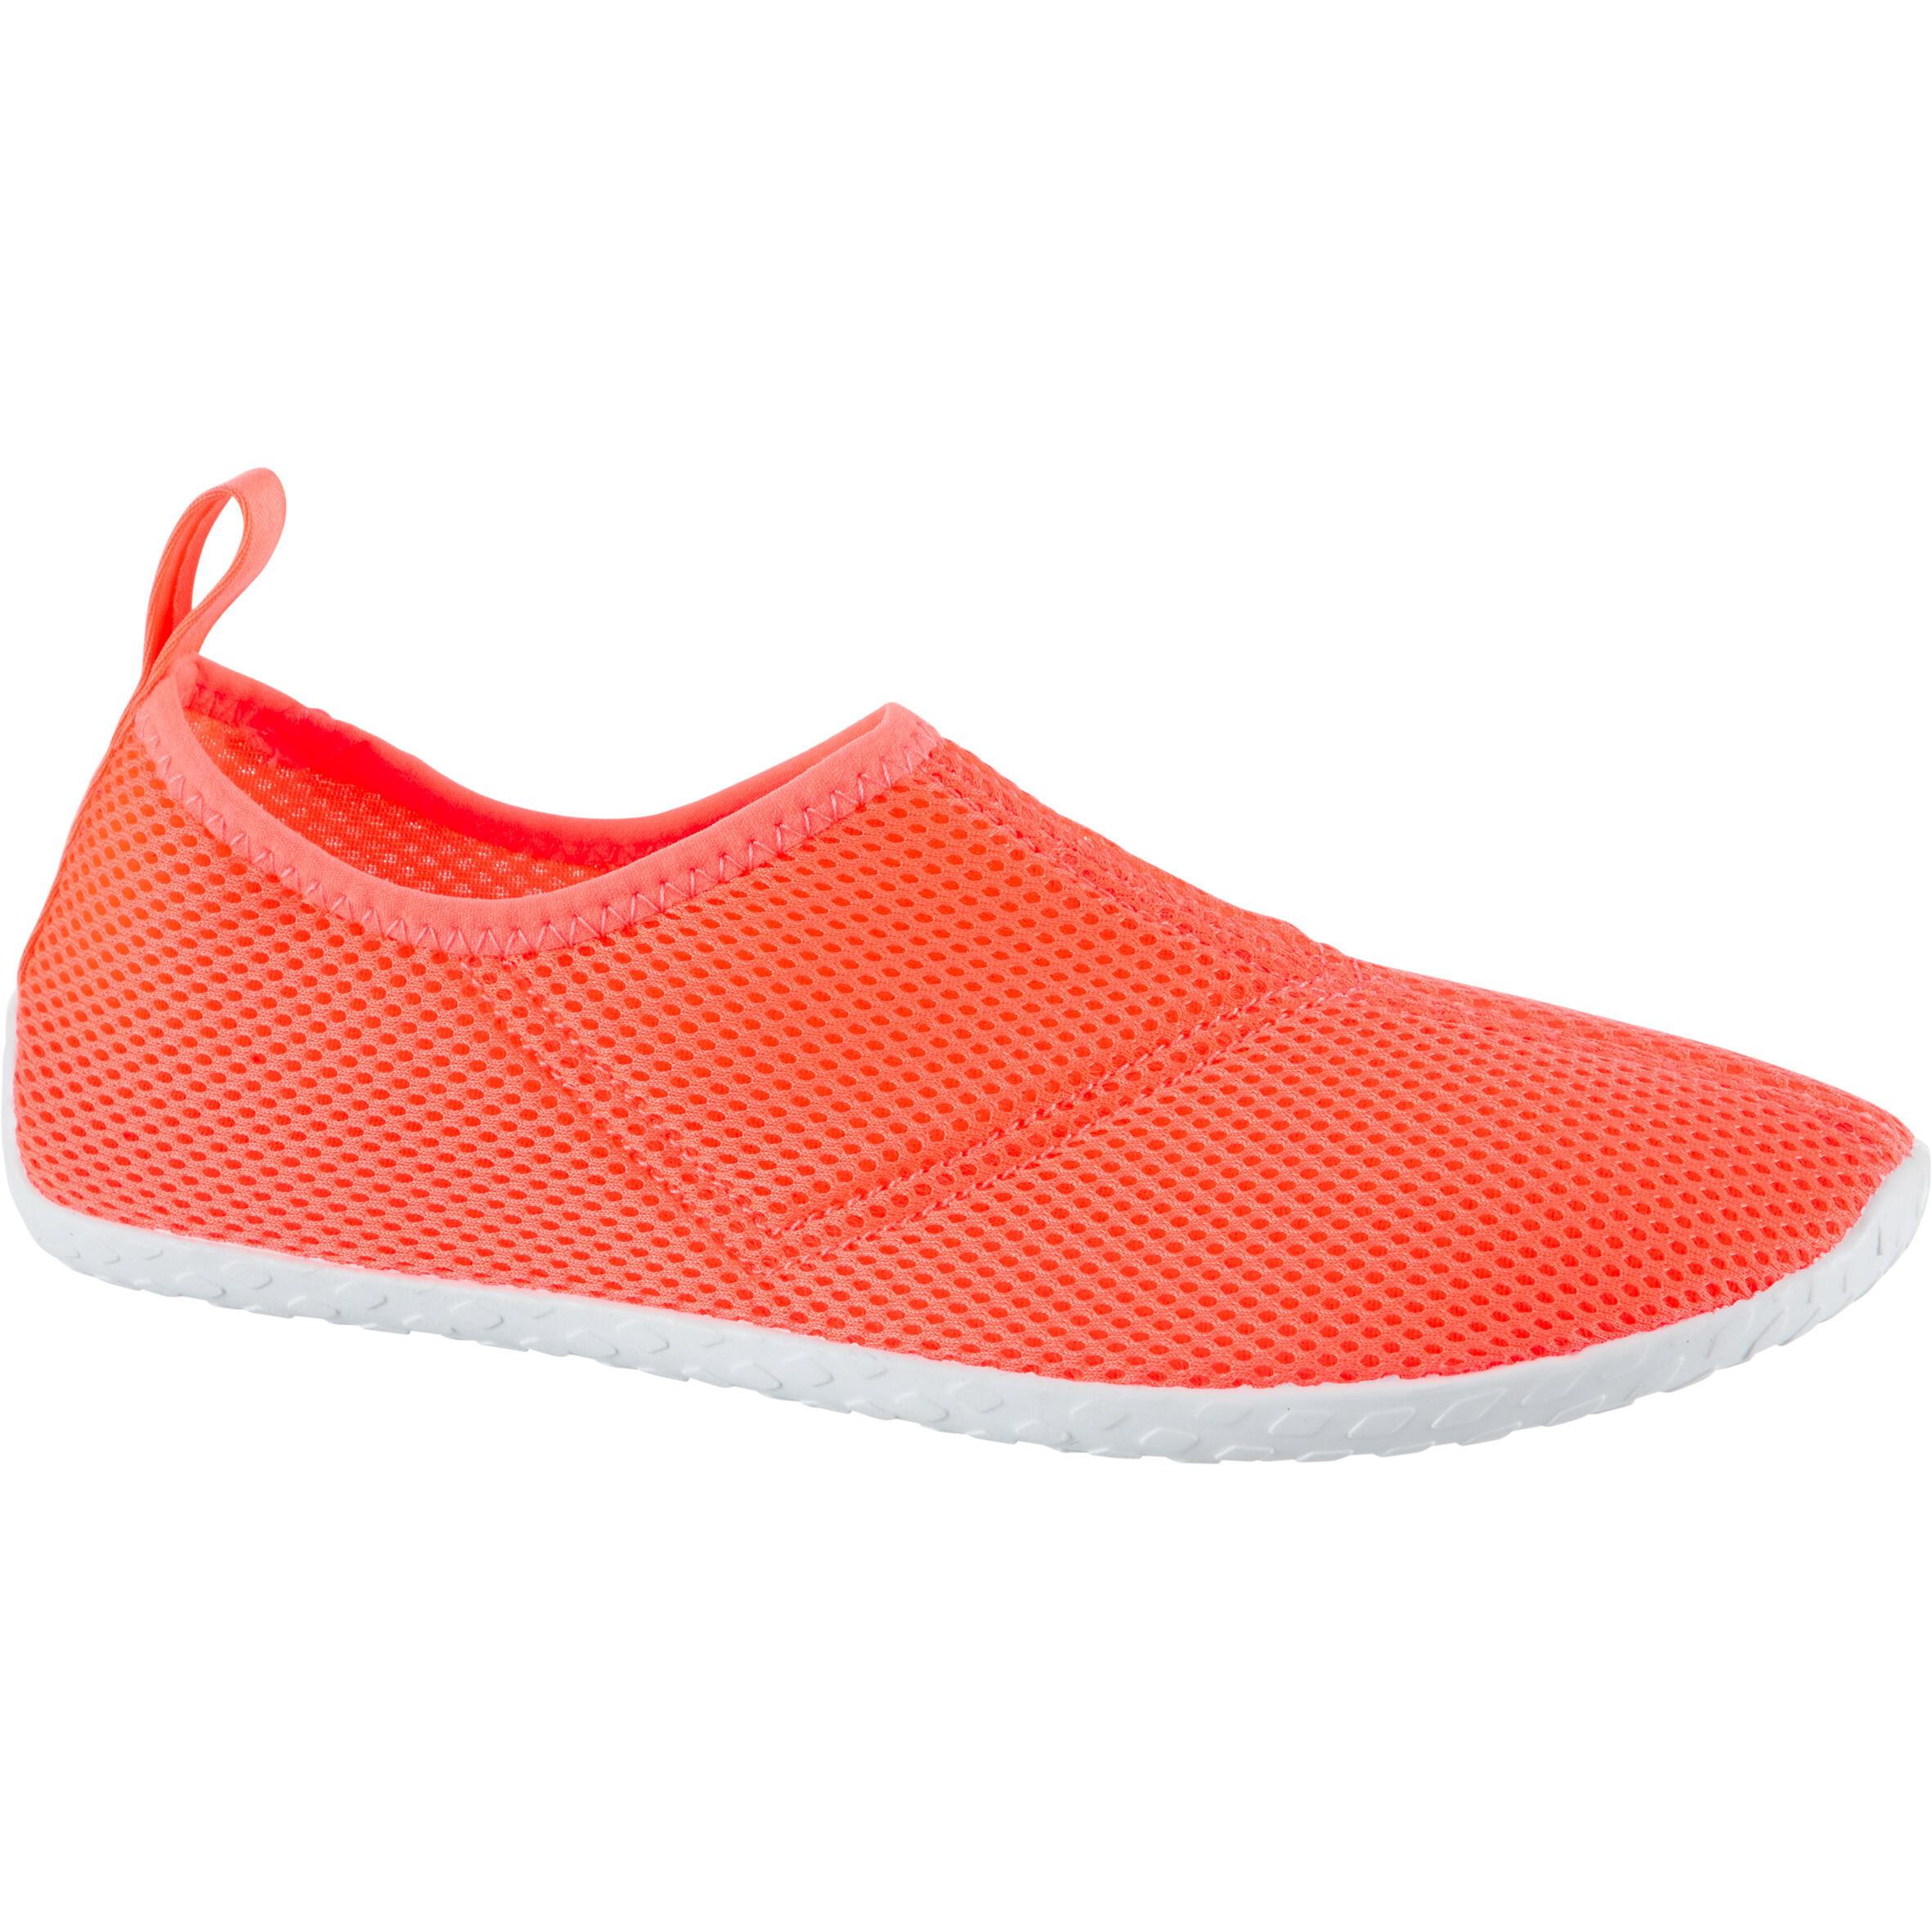 Aquaschuhe SNK 100 Erwachsene koralle | Schuhe > Badeschuhe | Rot - Rosa | Subea